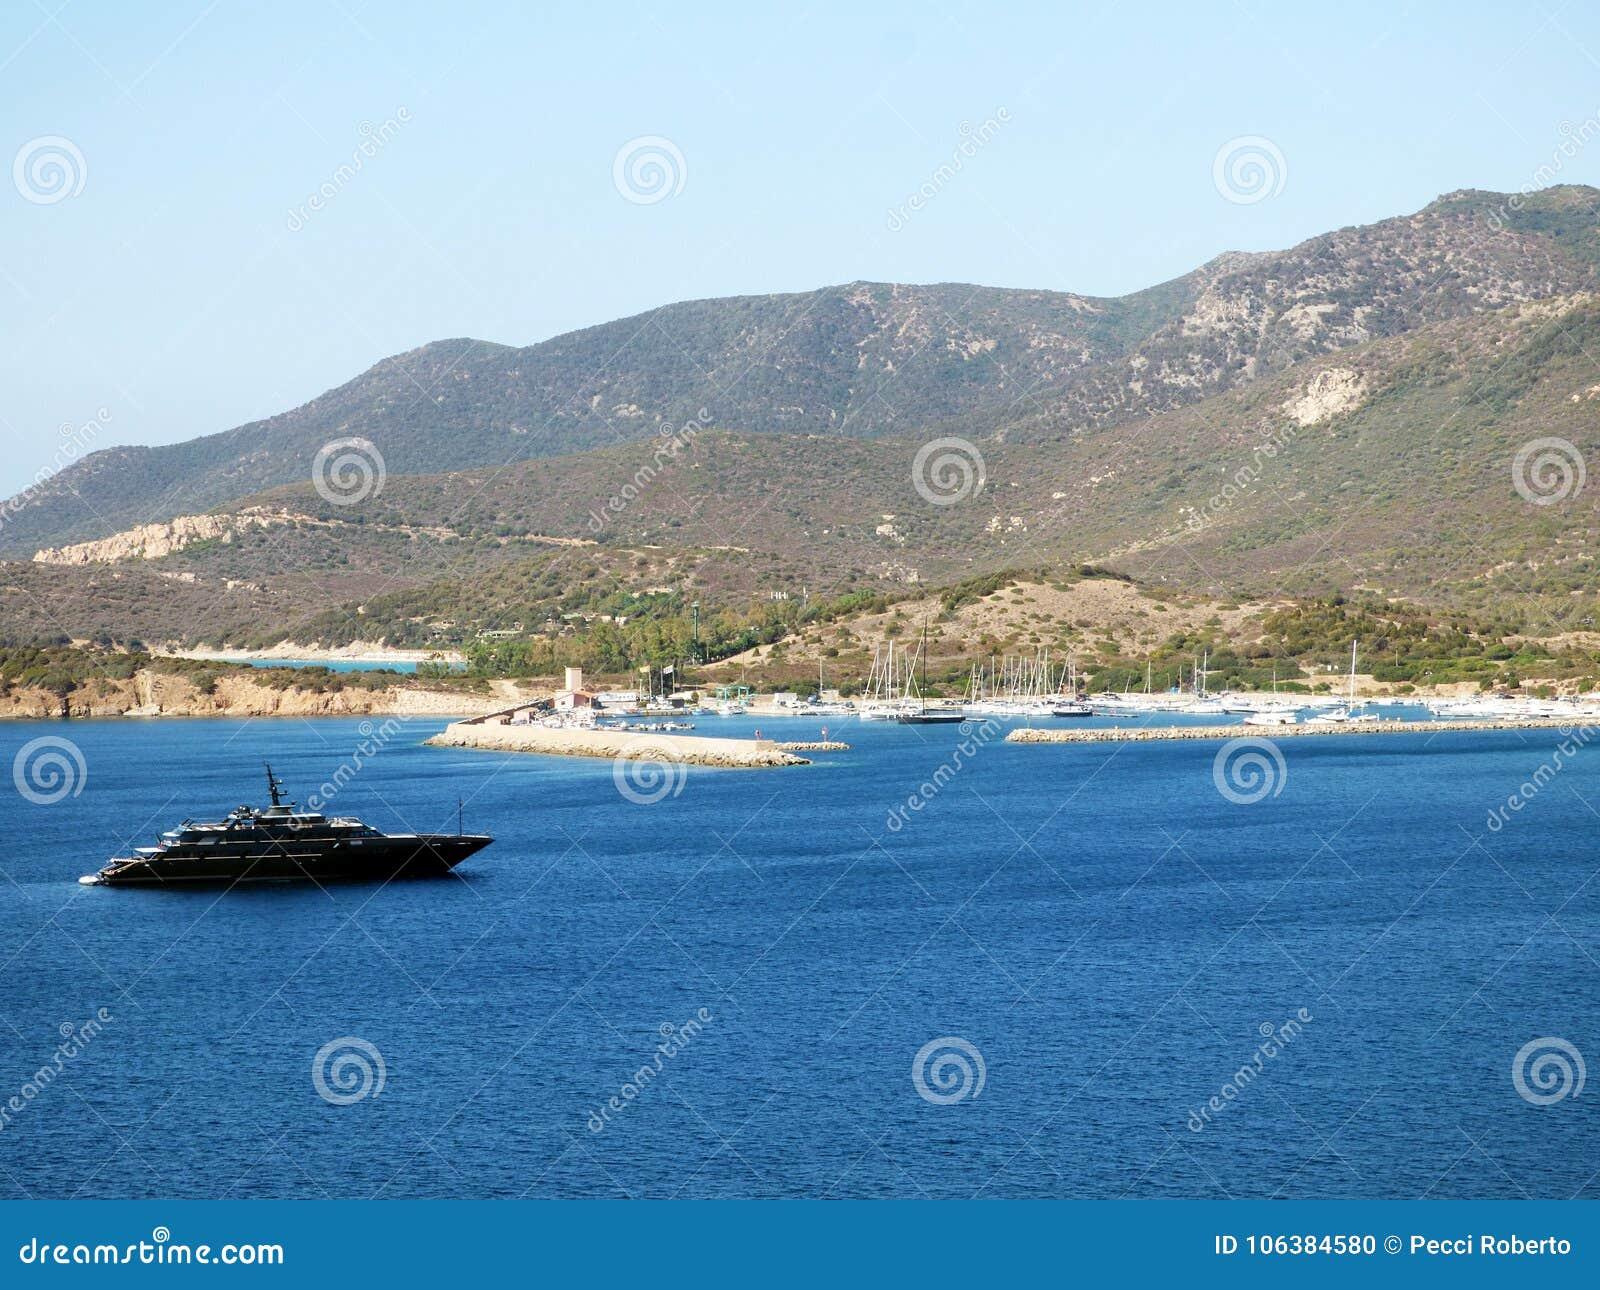 Port de l Italie, de la Sardaigne, de Teulada, du Budello, vue de la baie et la marina